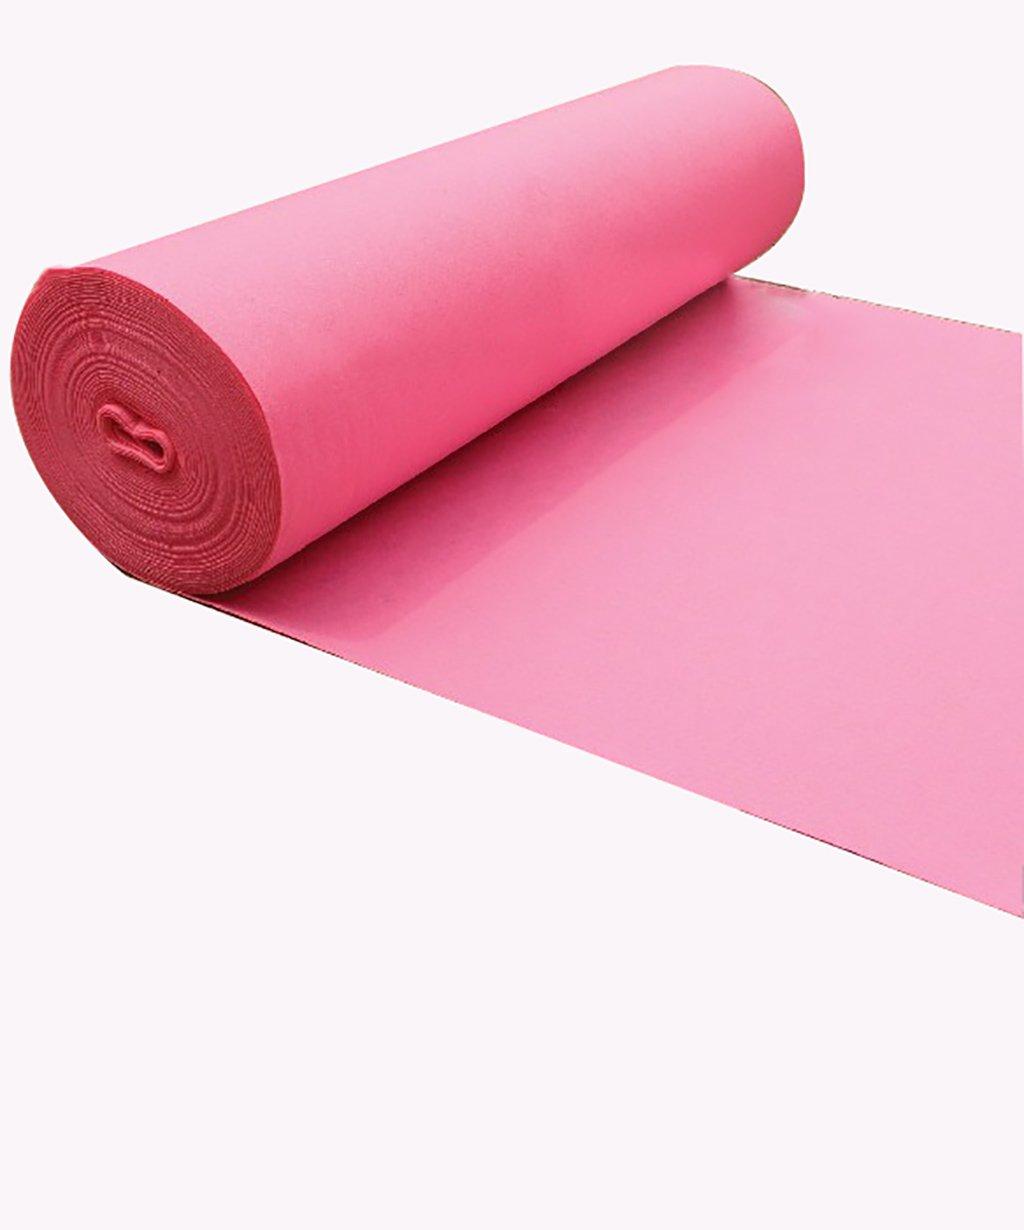 Jia He ウェディングランナー ウェディングカーペット使い捨て敷物、ブラシ付き不織布、ピンク、厚さ2mmオプションの9枚 @@ (サイズ さいず : 1.5m*30m*2mm) B07QHW4BKS  1.5m*30m*2mm